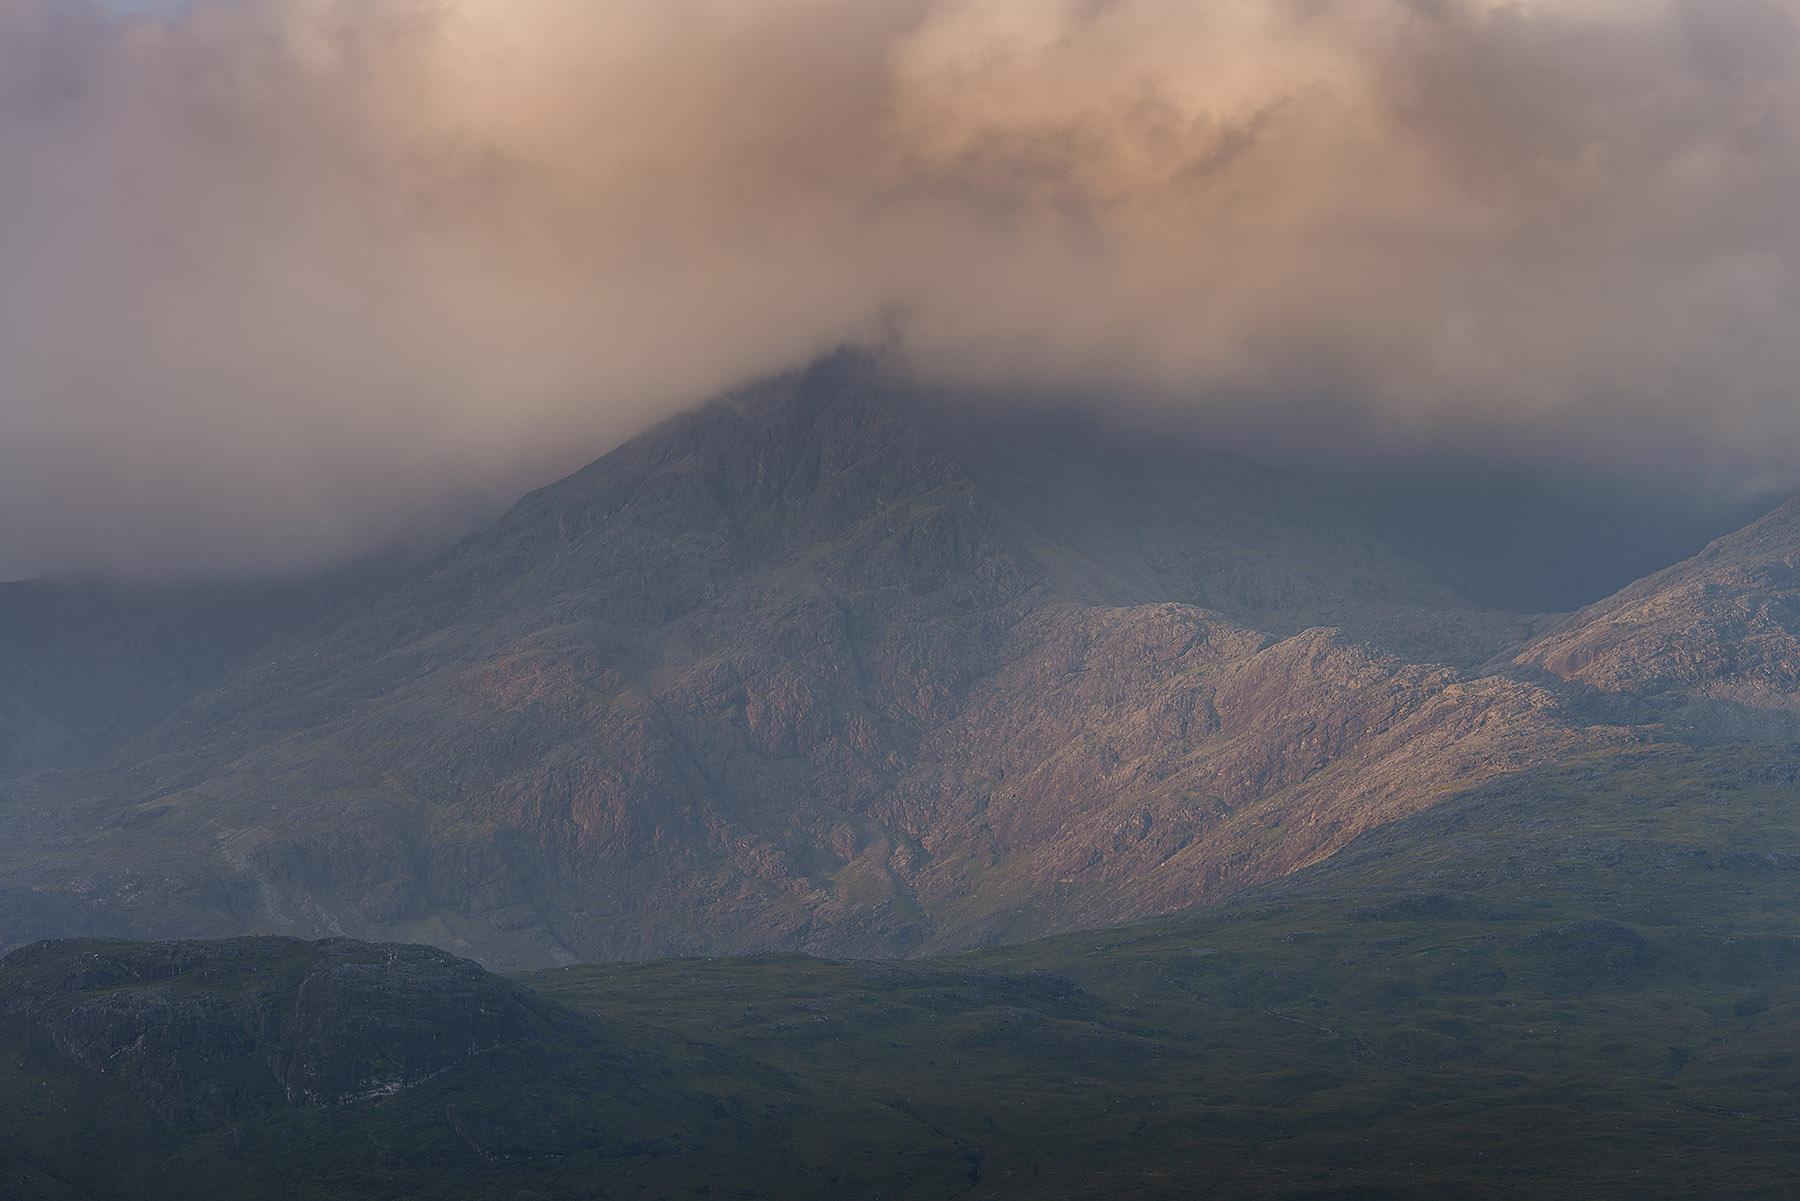 Cuillin Mist, Skye - Scotland